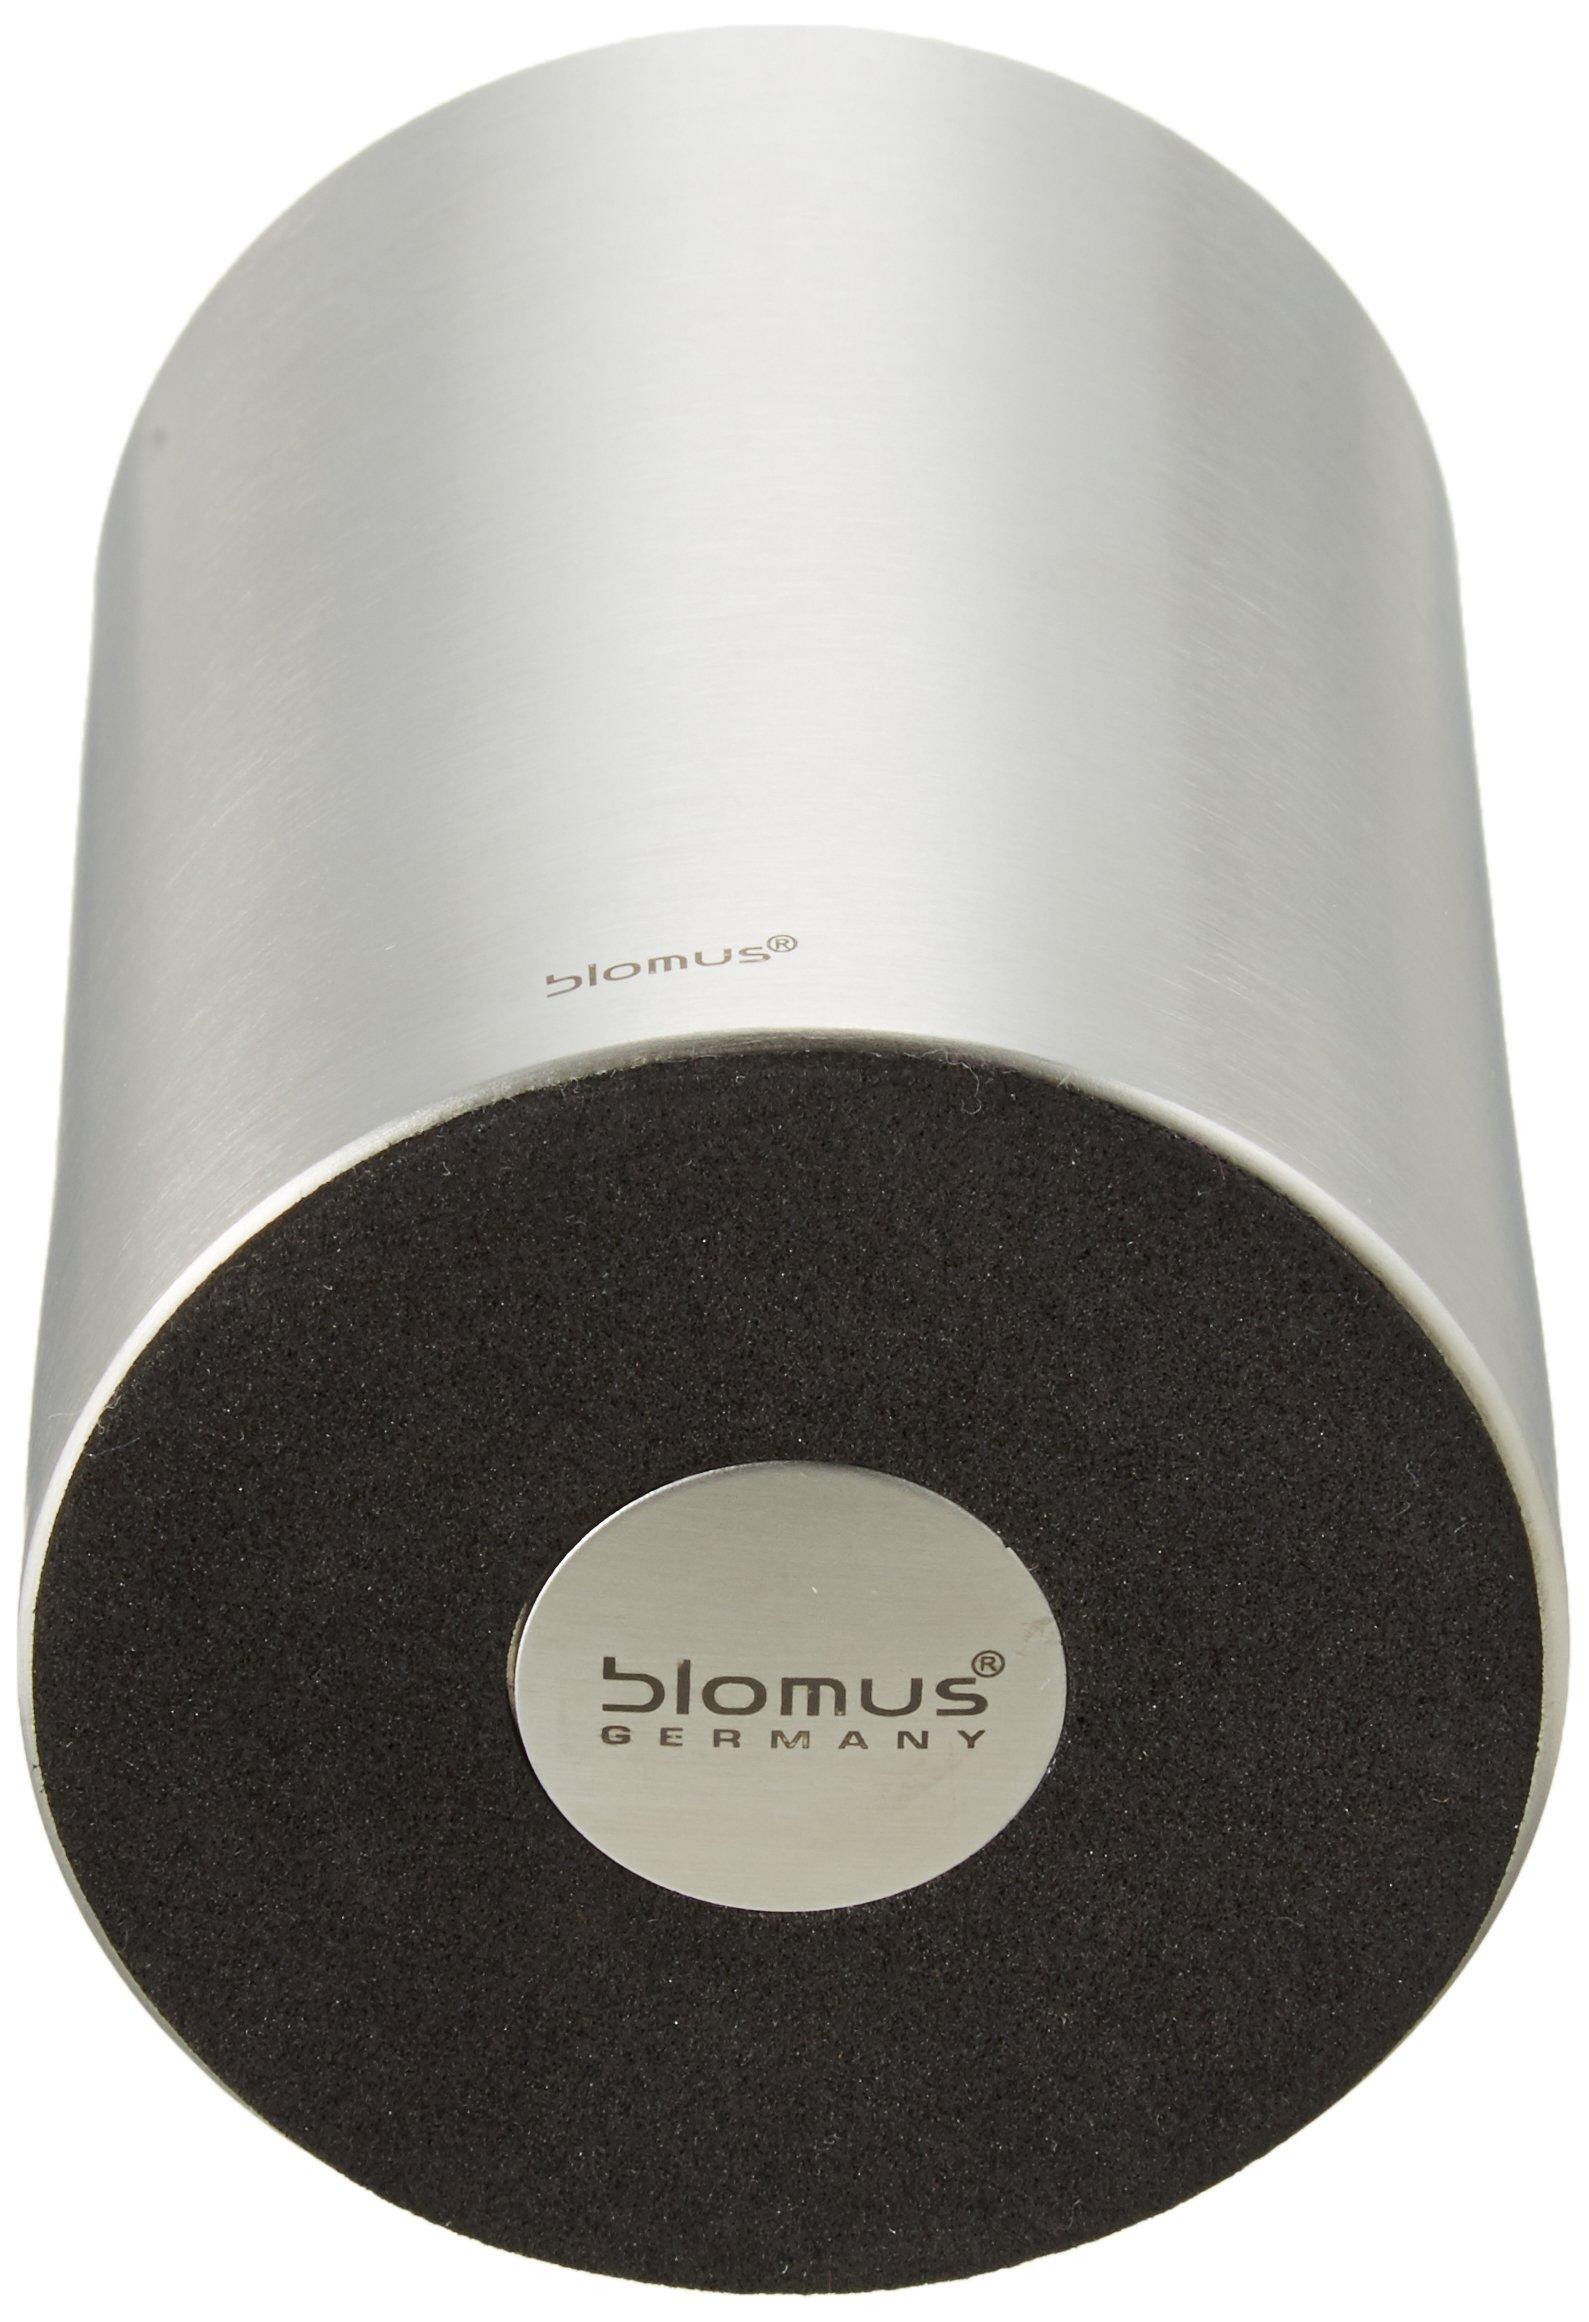 Blomus Ashtray with Hinged Lid Diameter 12 cm